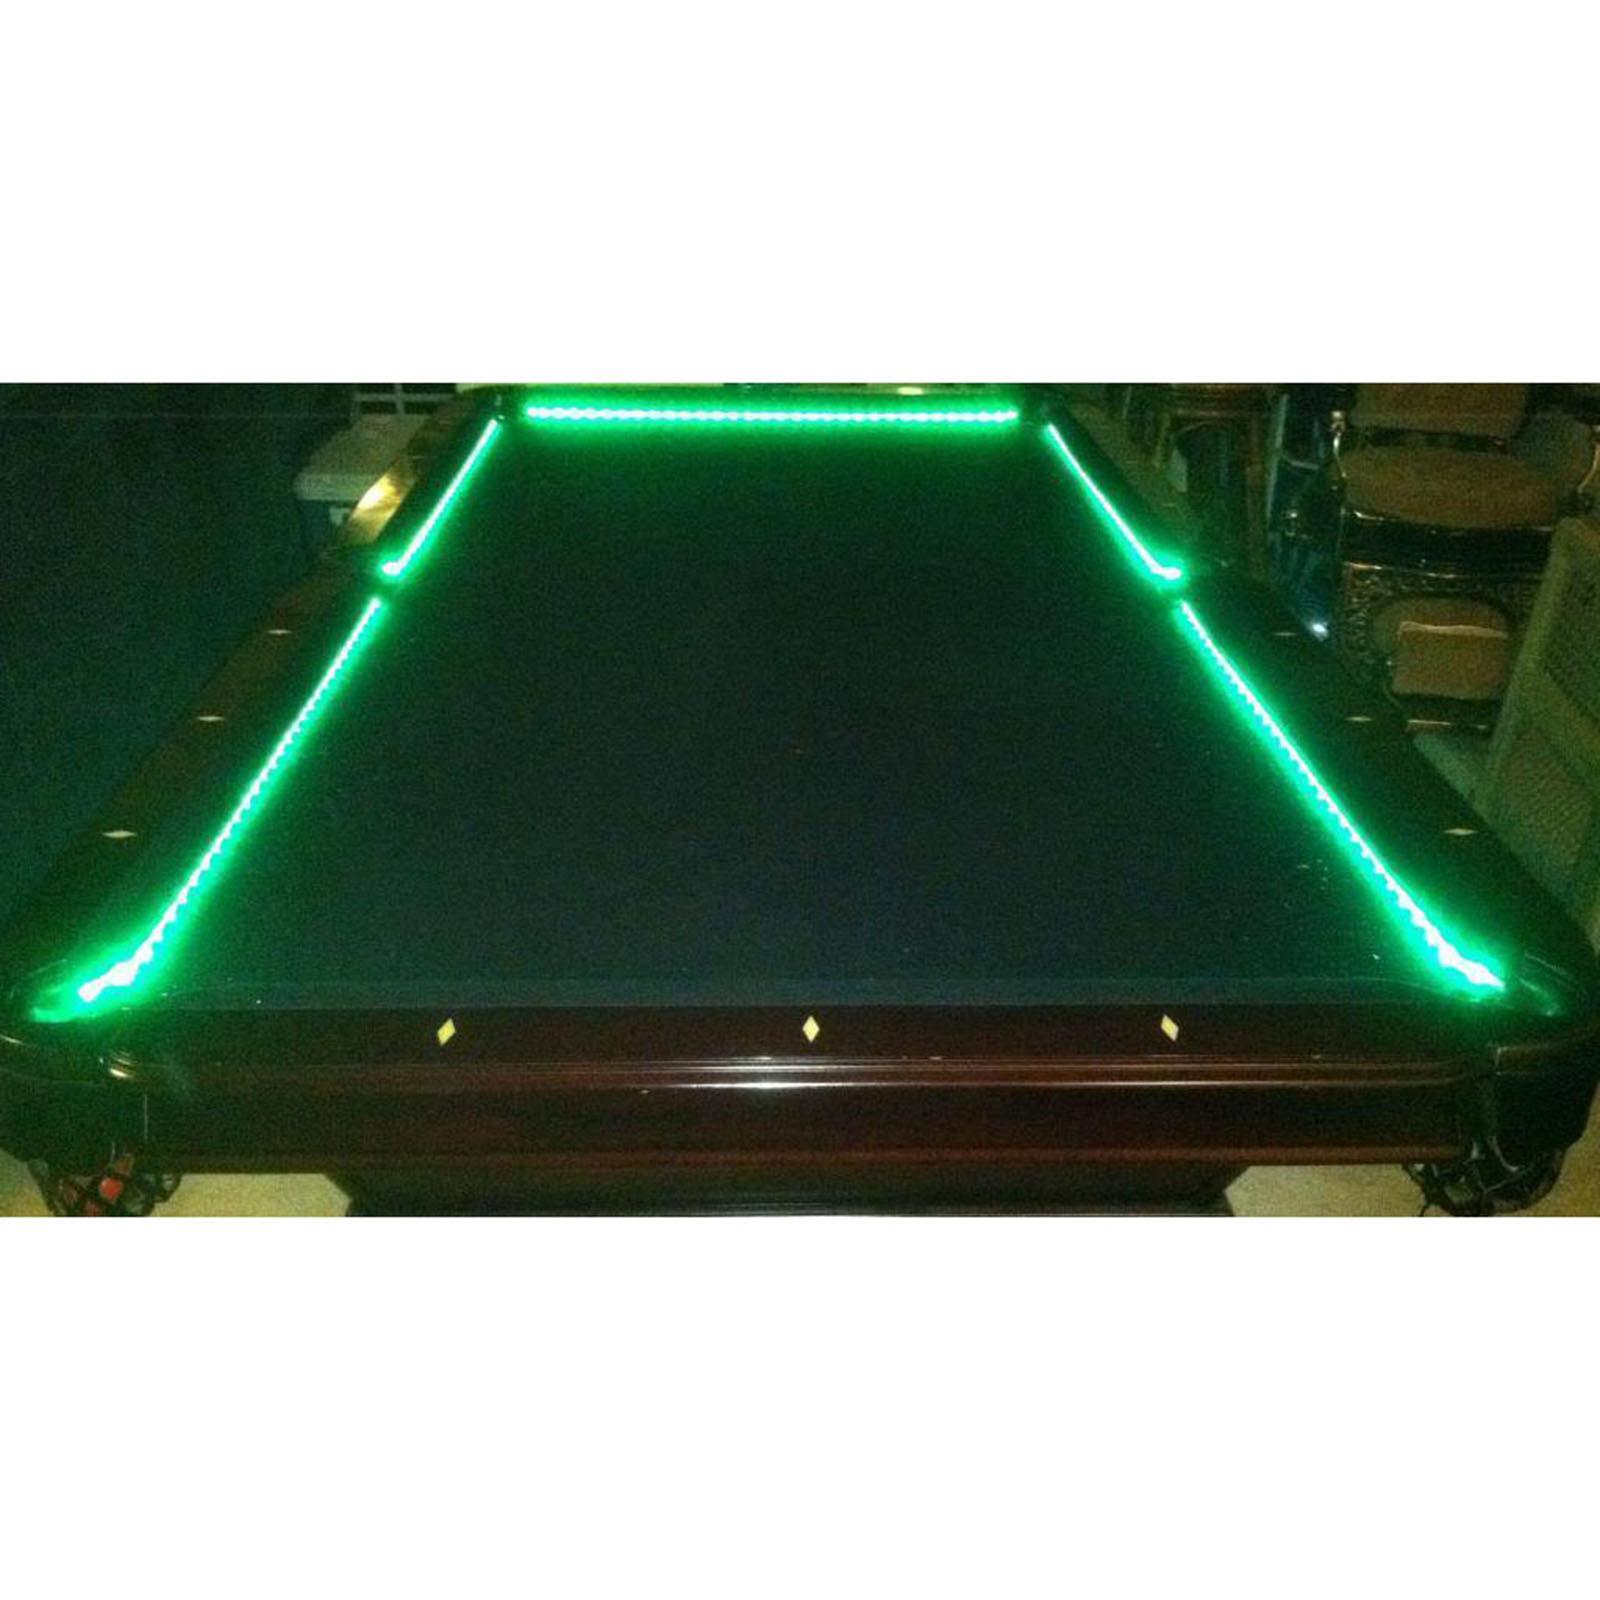 Bar Billiard Pool Table Bumper LED RGB Color Changing